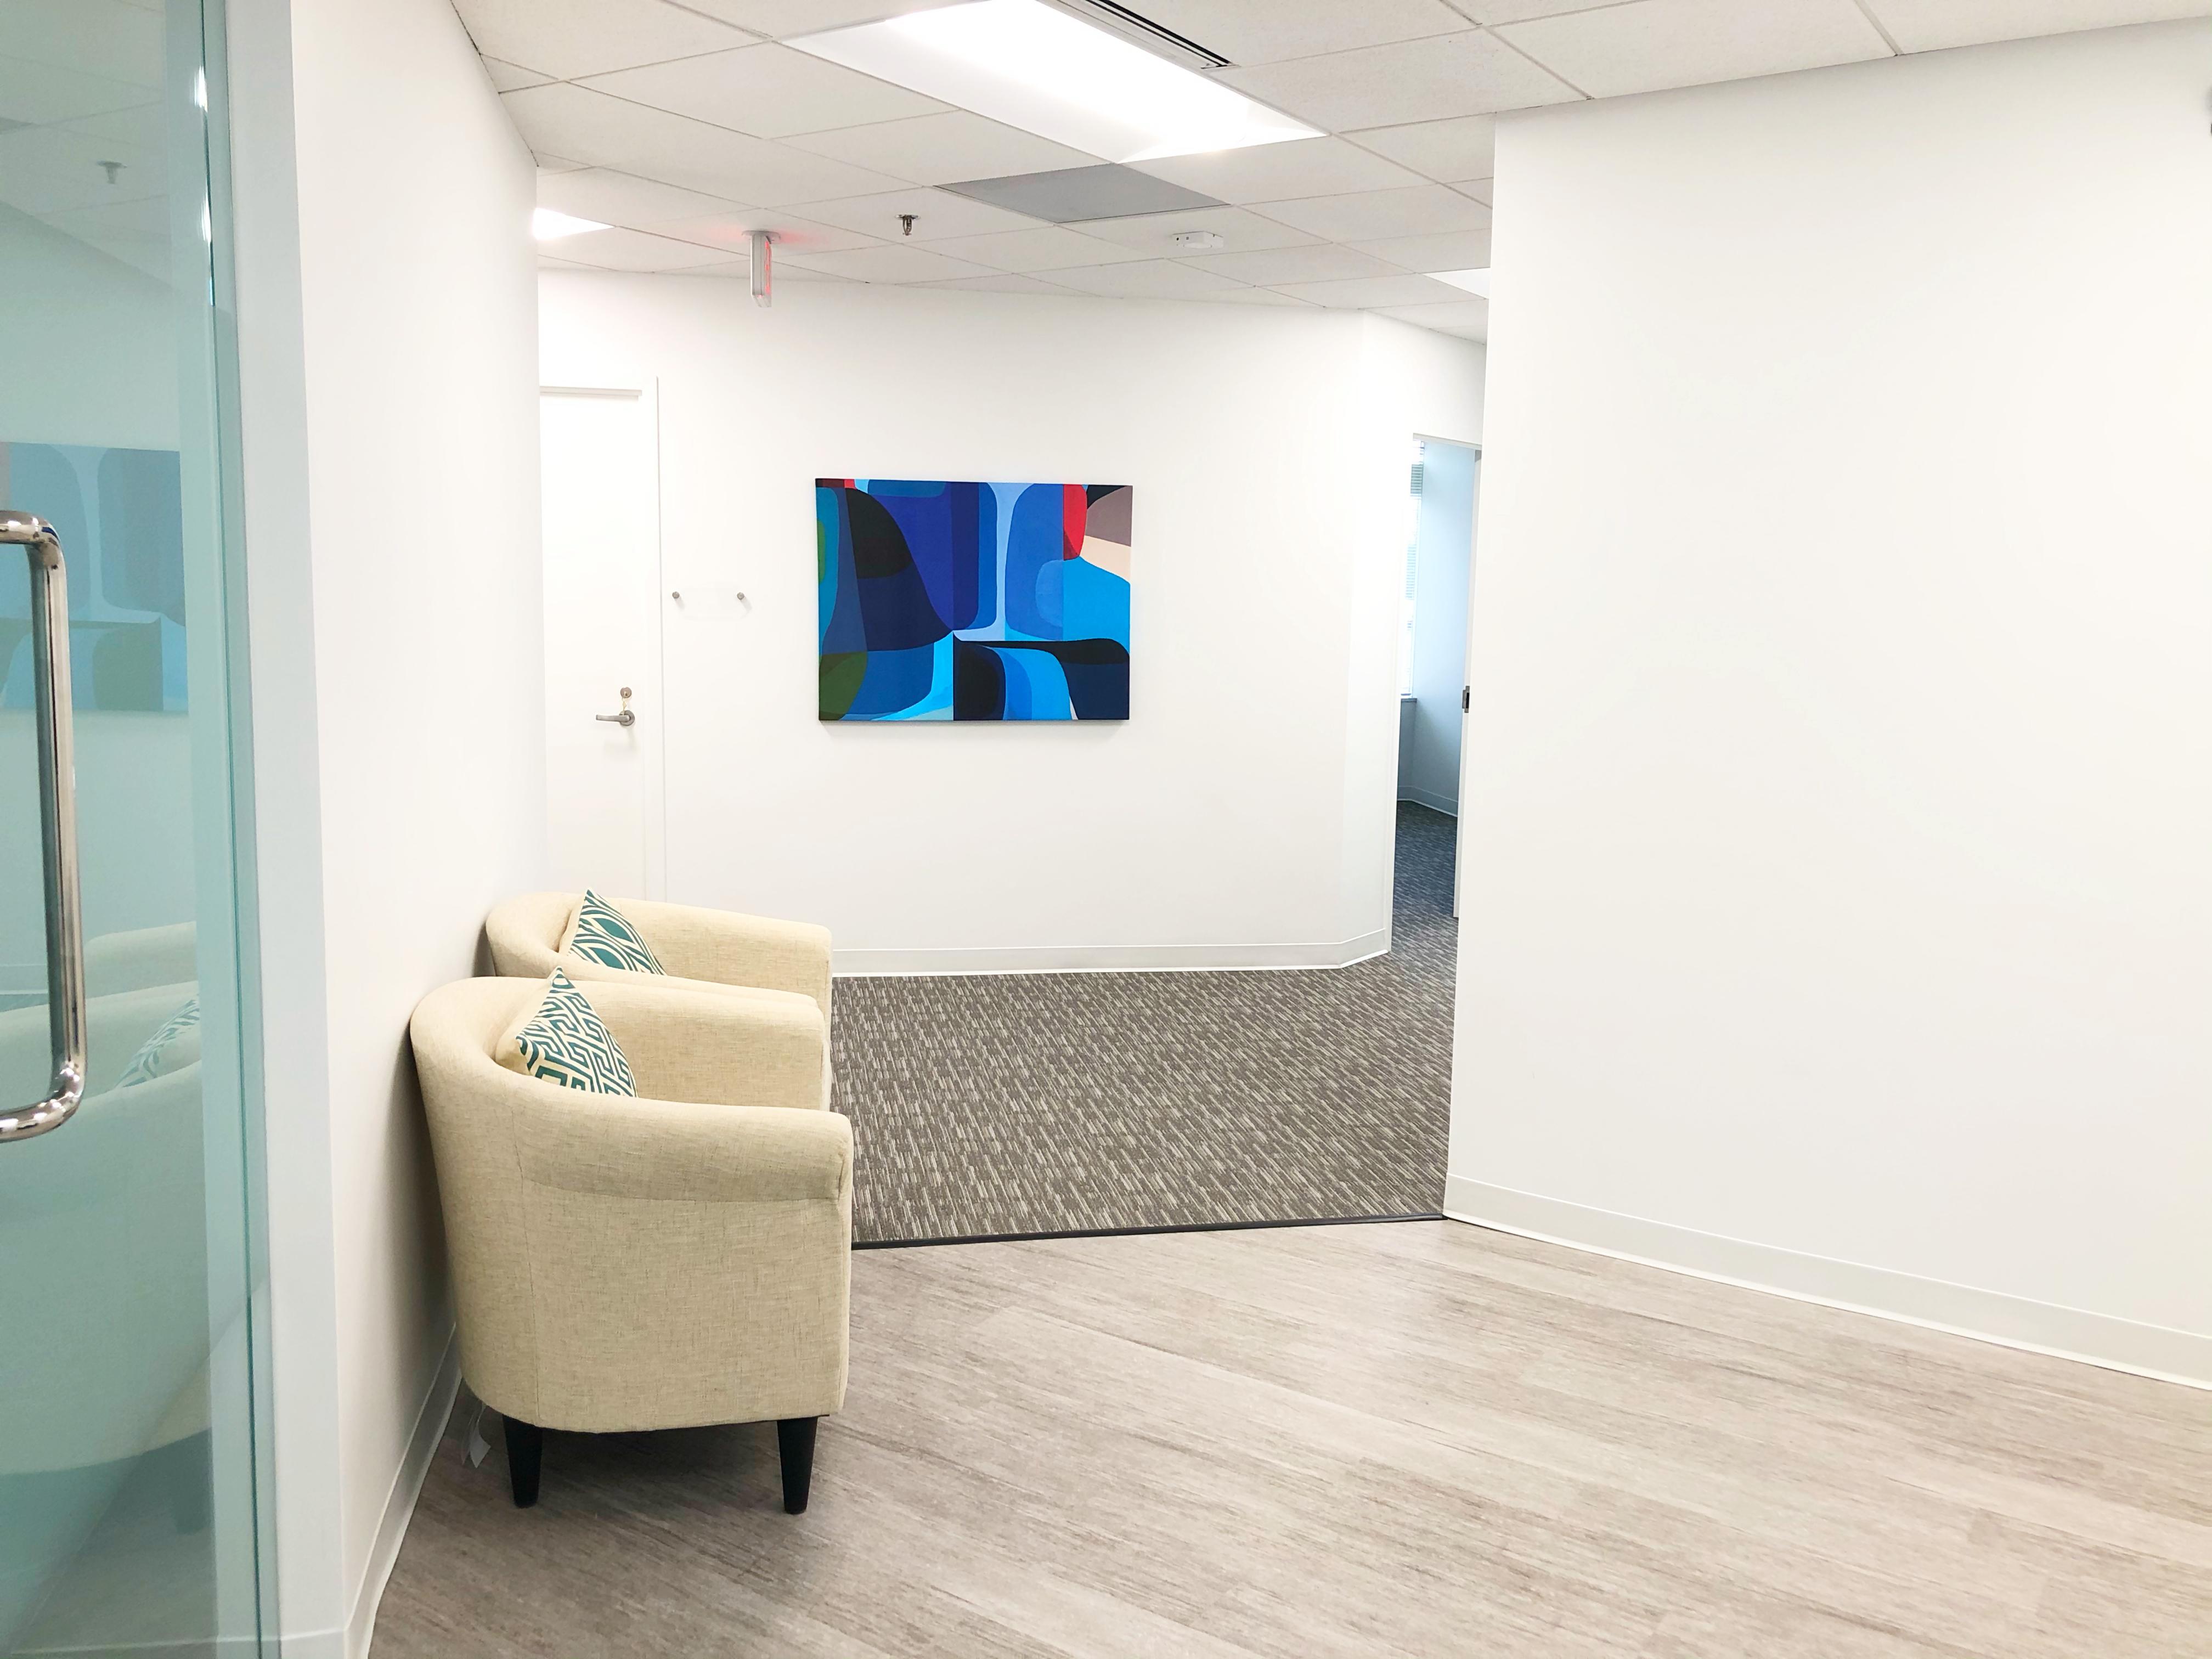 Receptionist Lobby - Virtual Offices in Fairfax